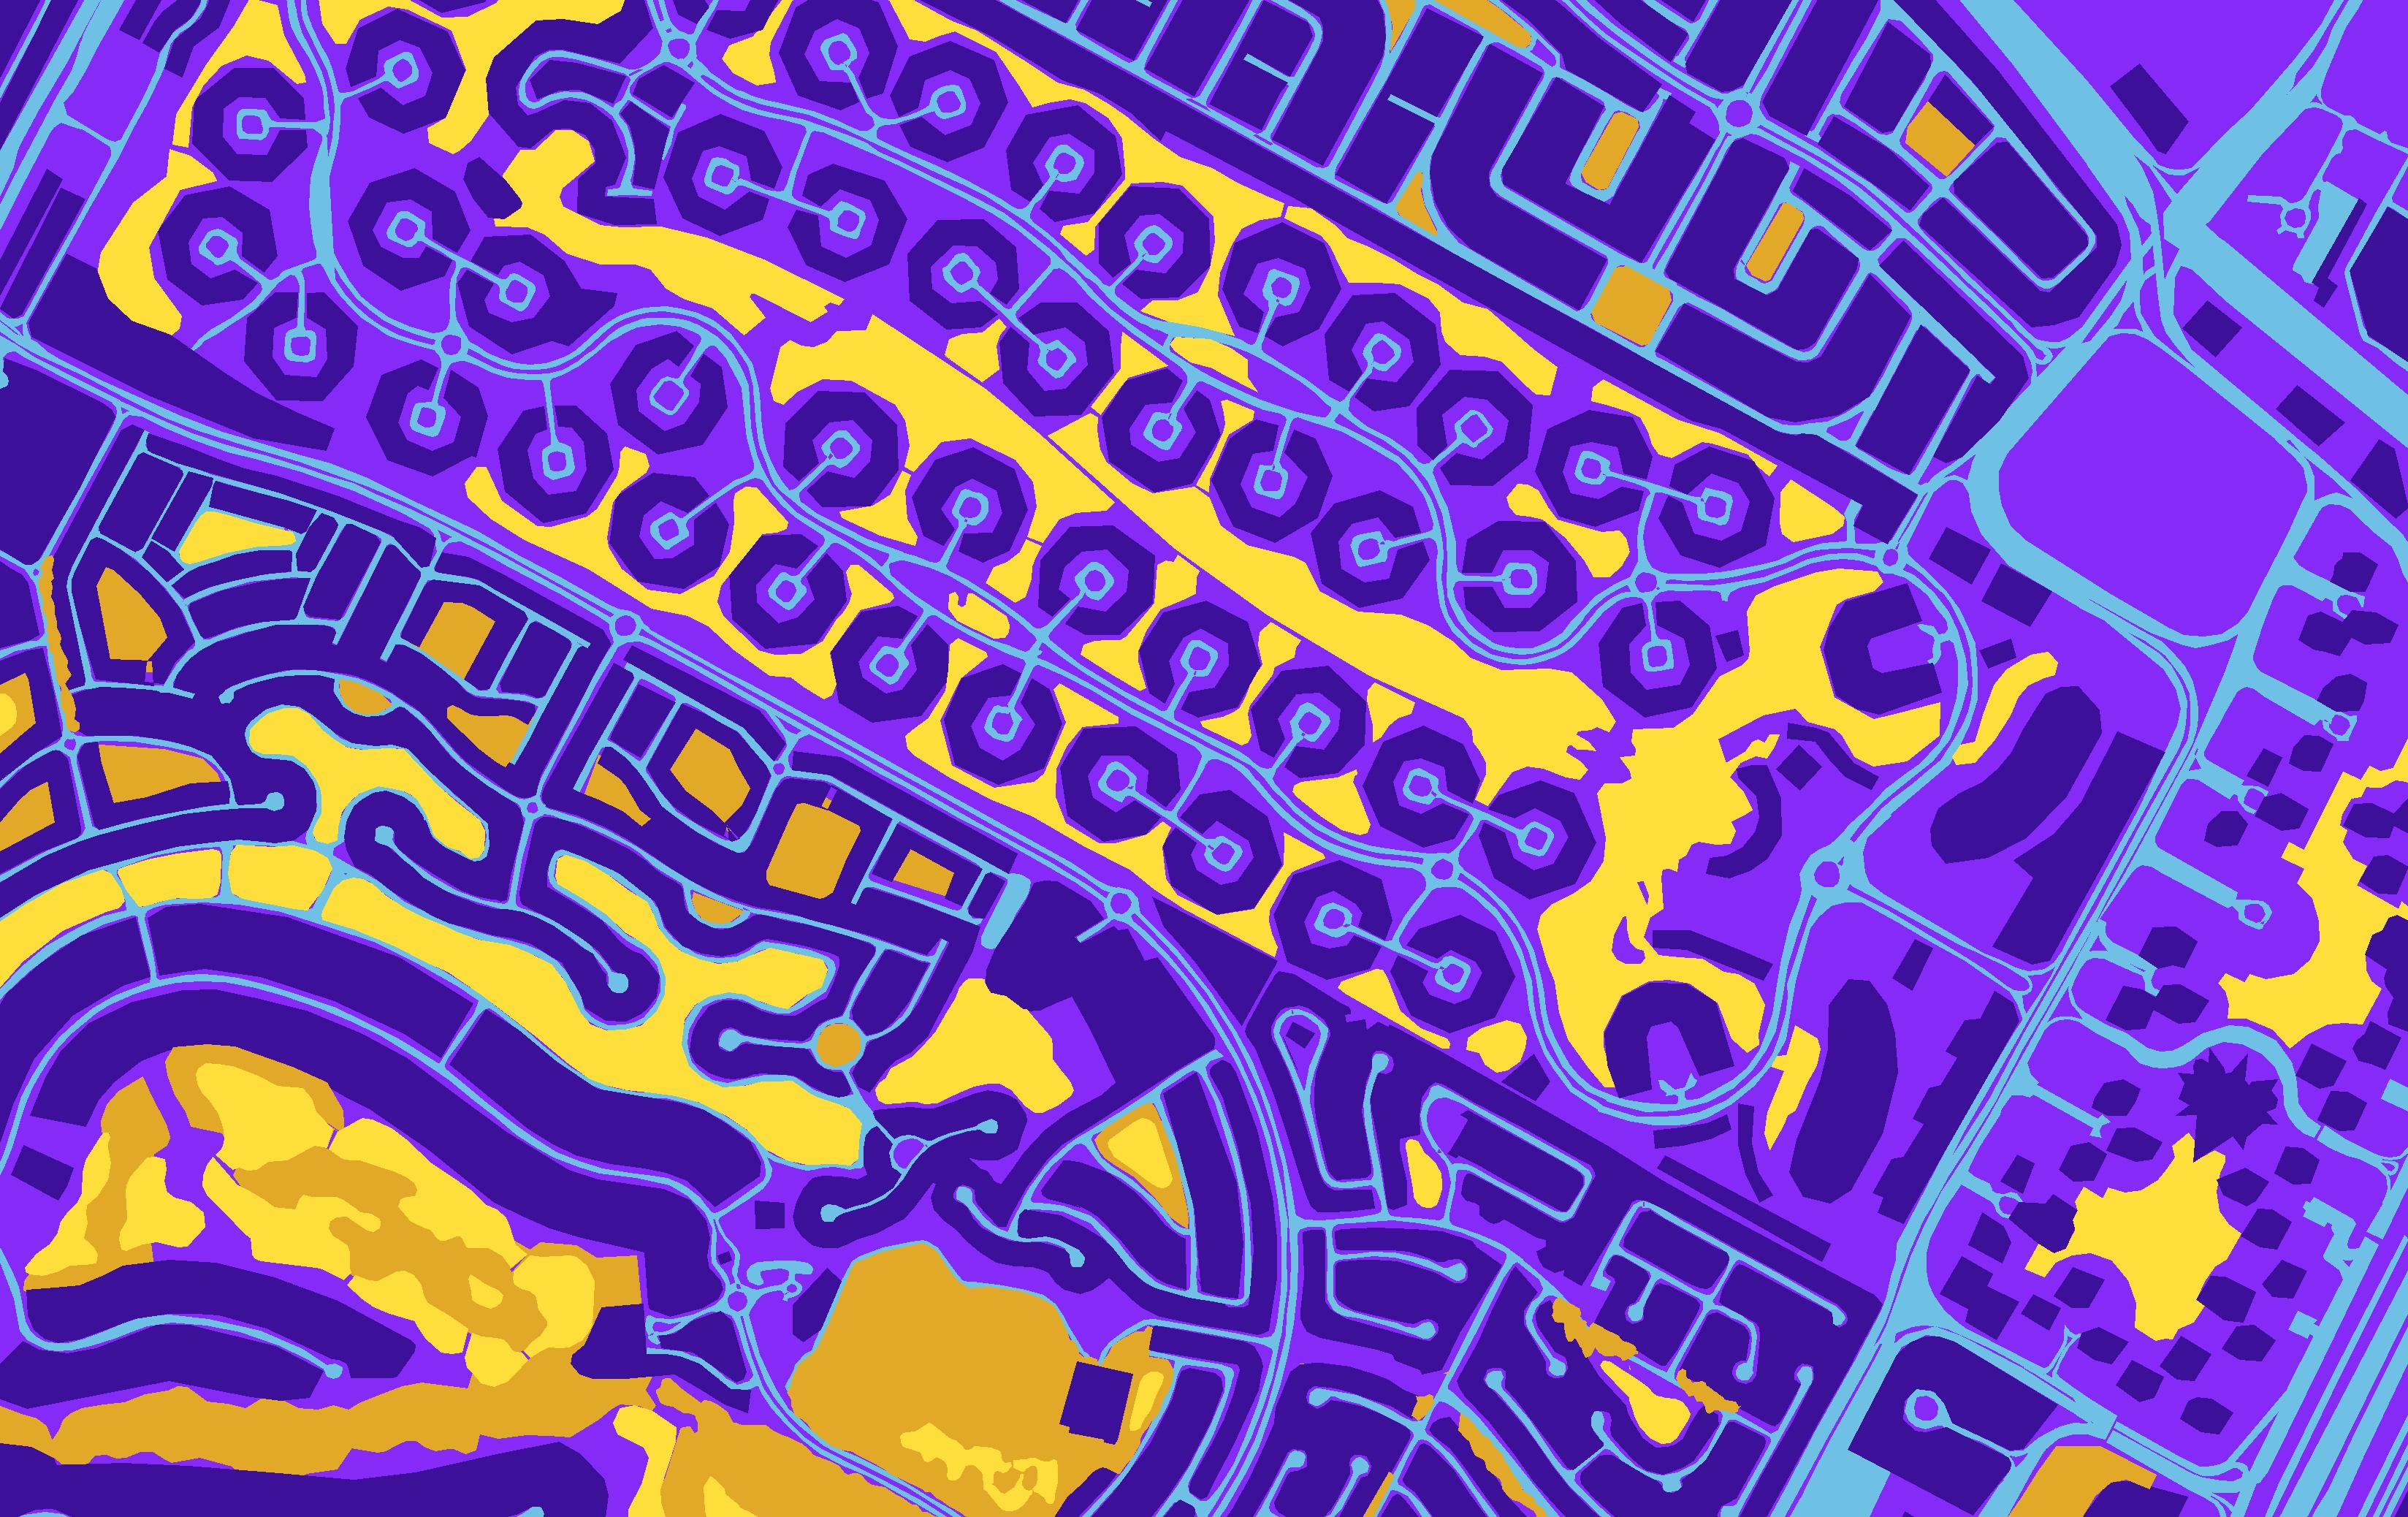 Full pixel-wise semantic segmentation